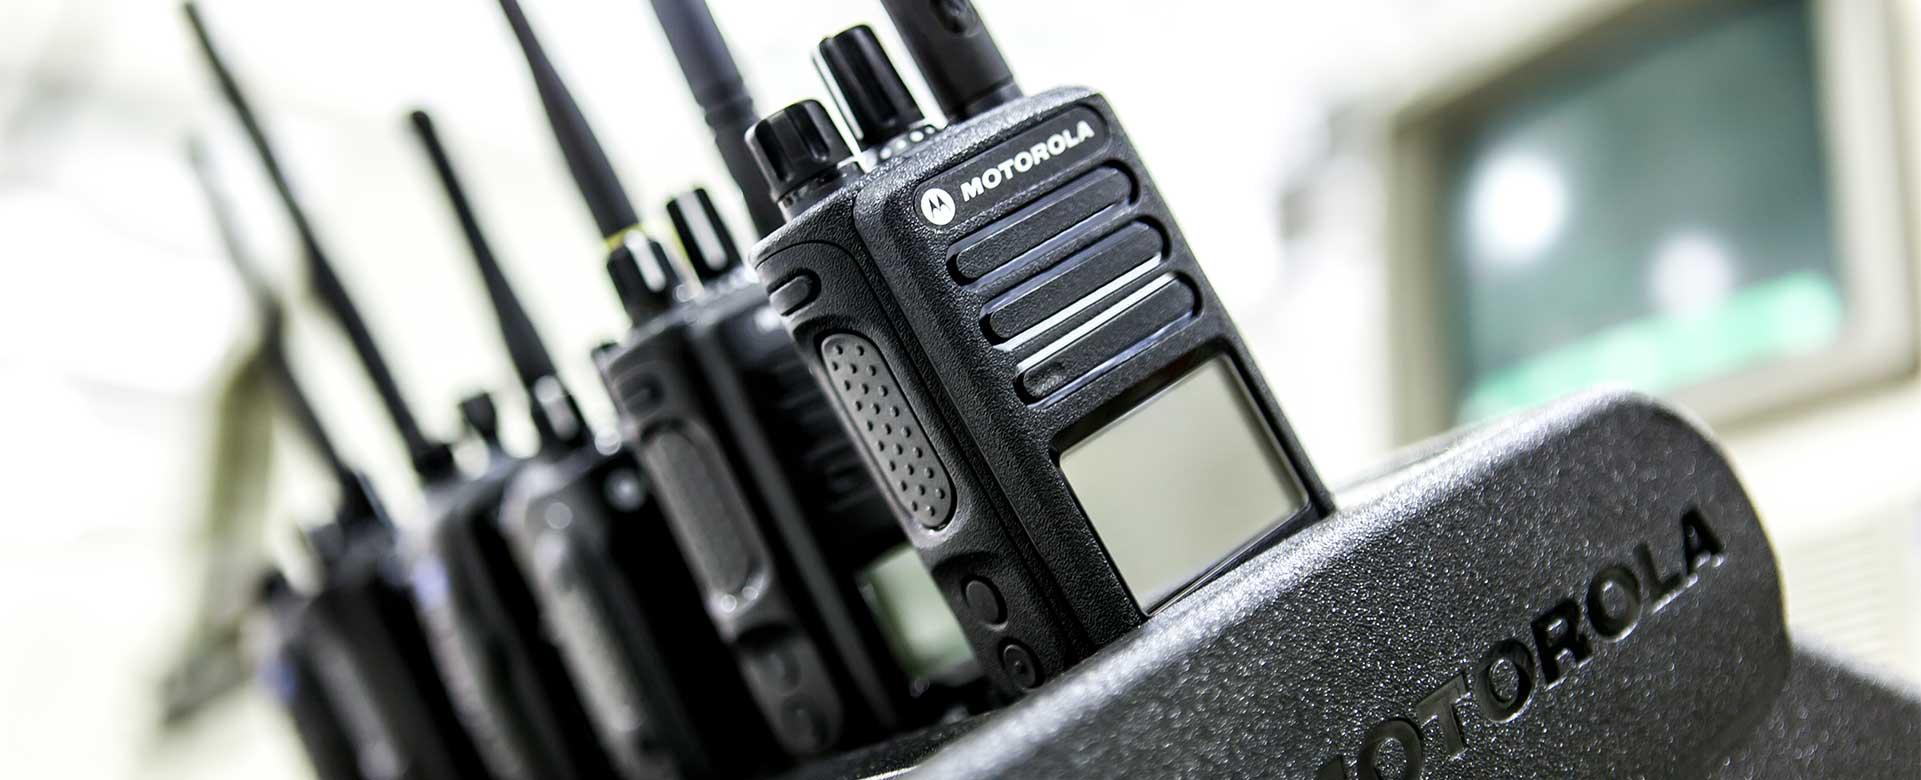 Mobile One Communications Motorola Two Way Radio Dealer